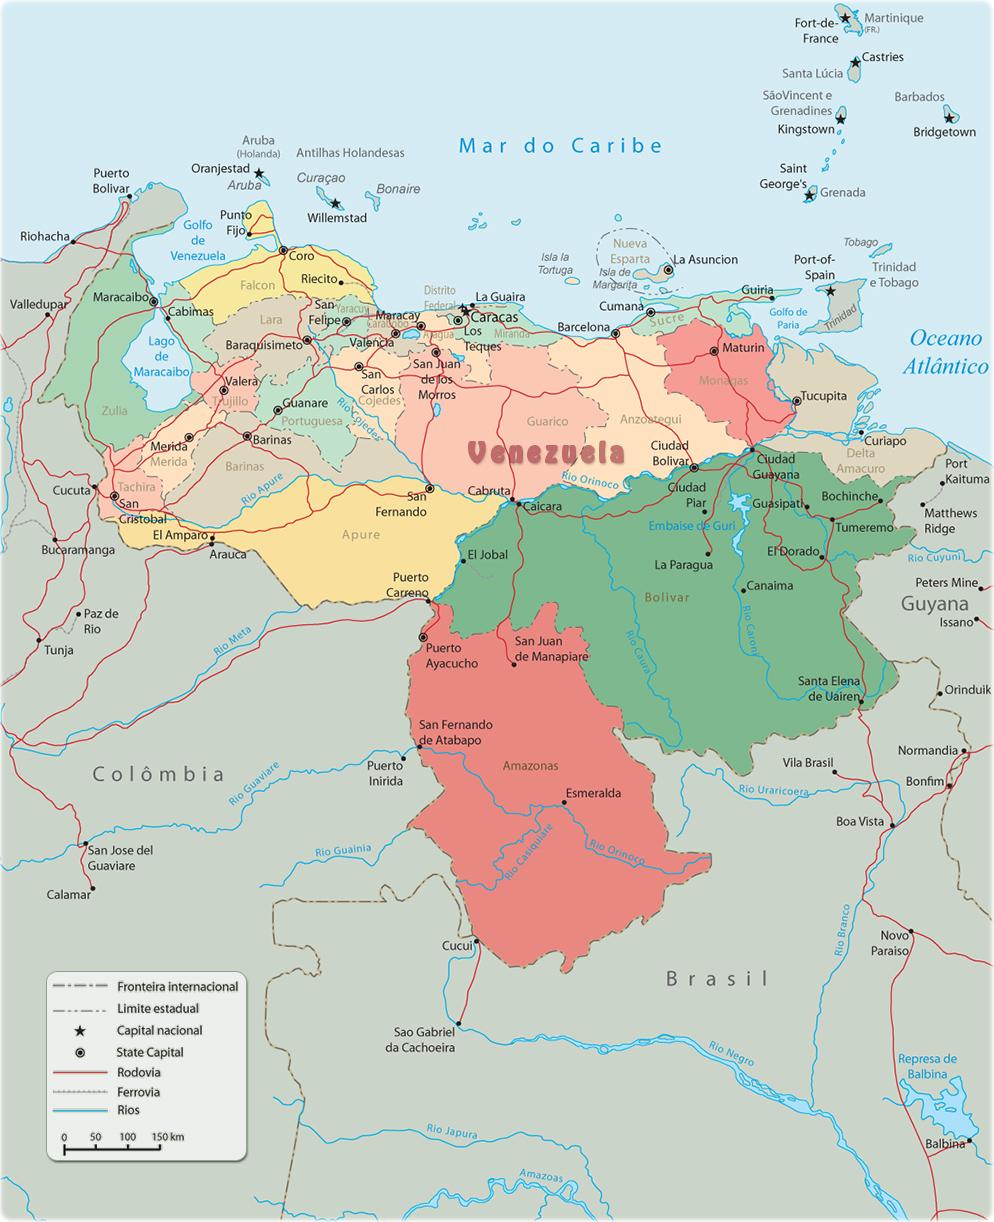 Mapas Geográficos de Venezuela